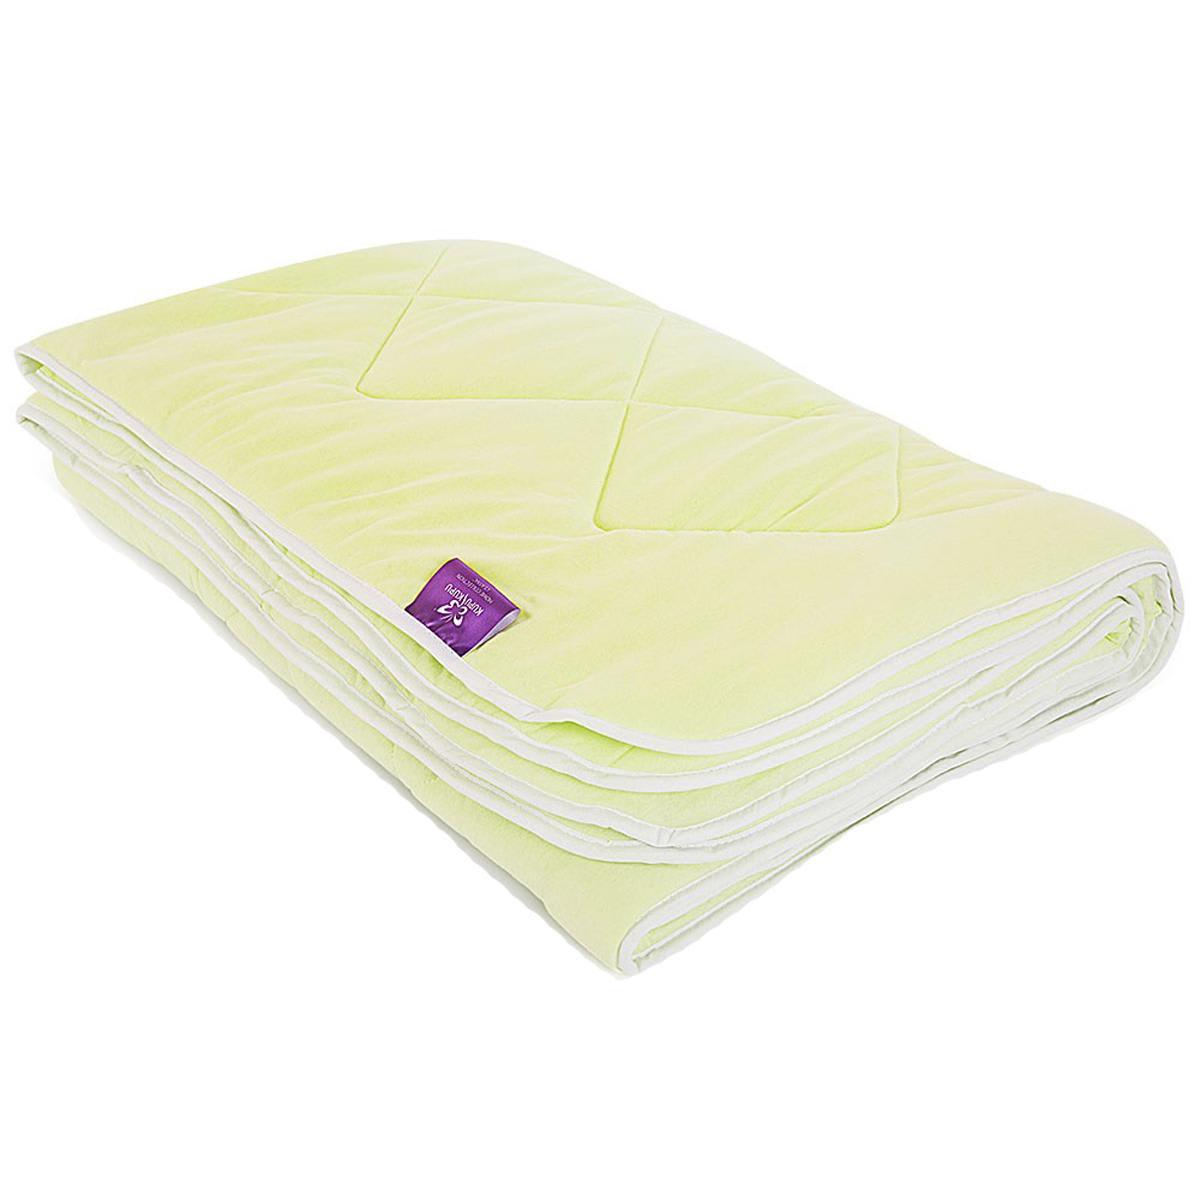 Одеяло «KUPU-KUPU» Classik 205х140 см, бамбук